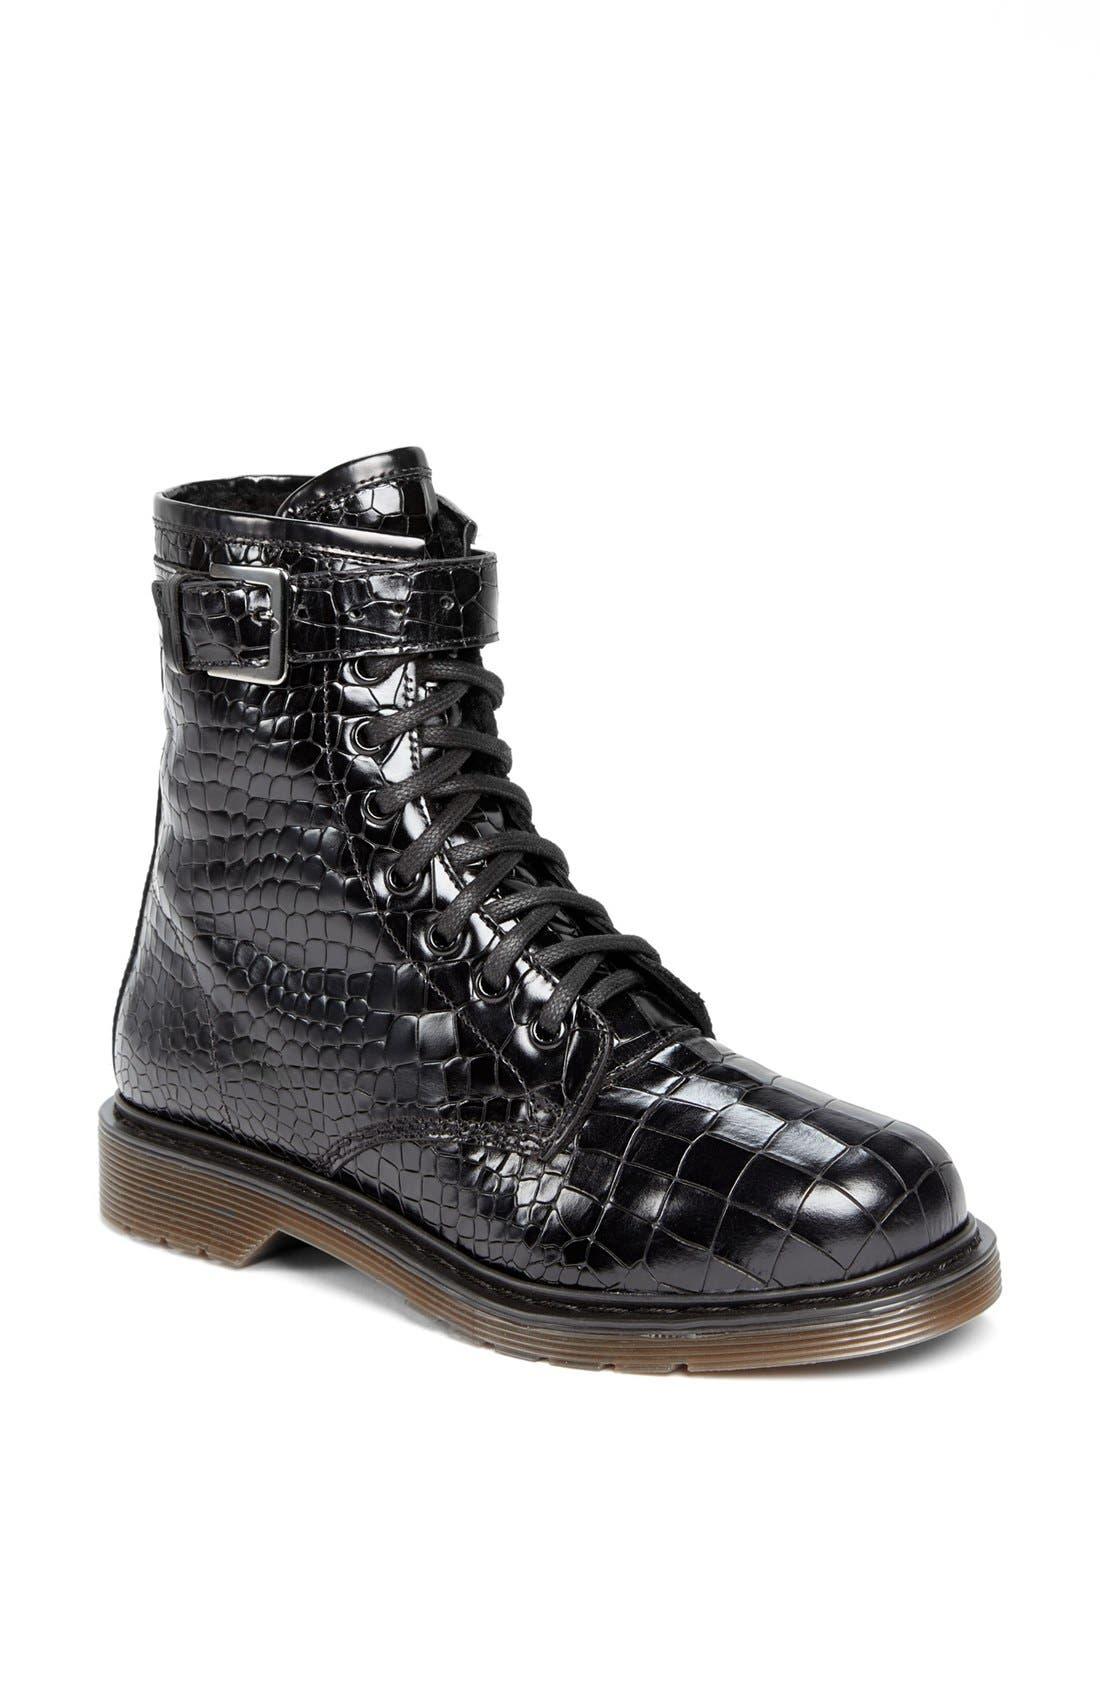 Alternate Image 1 Selected - Kurt Geiger London 'Steell' Croc Embossed Leather Boot